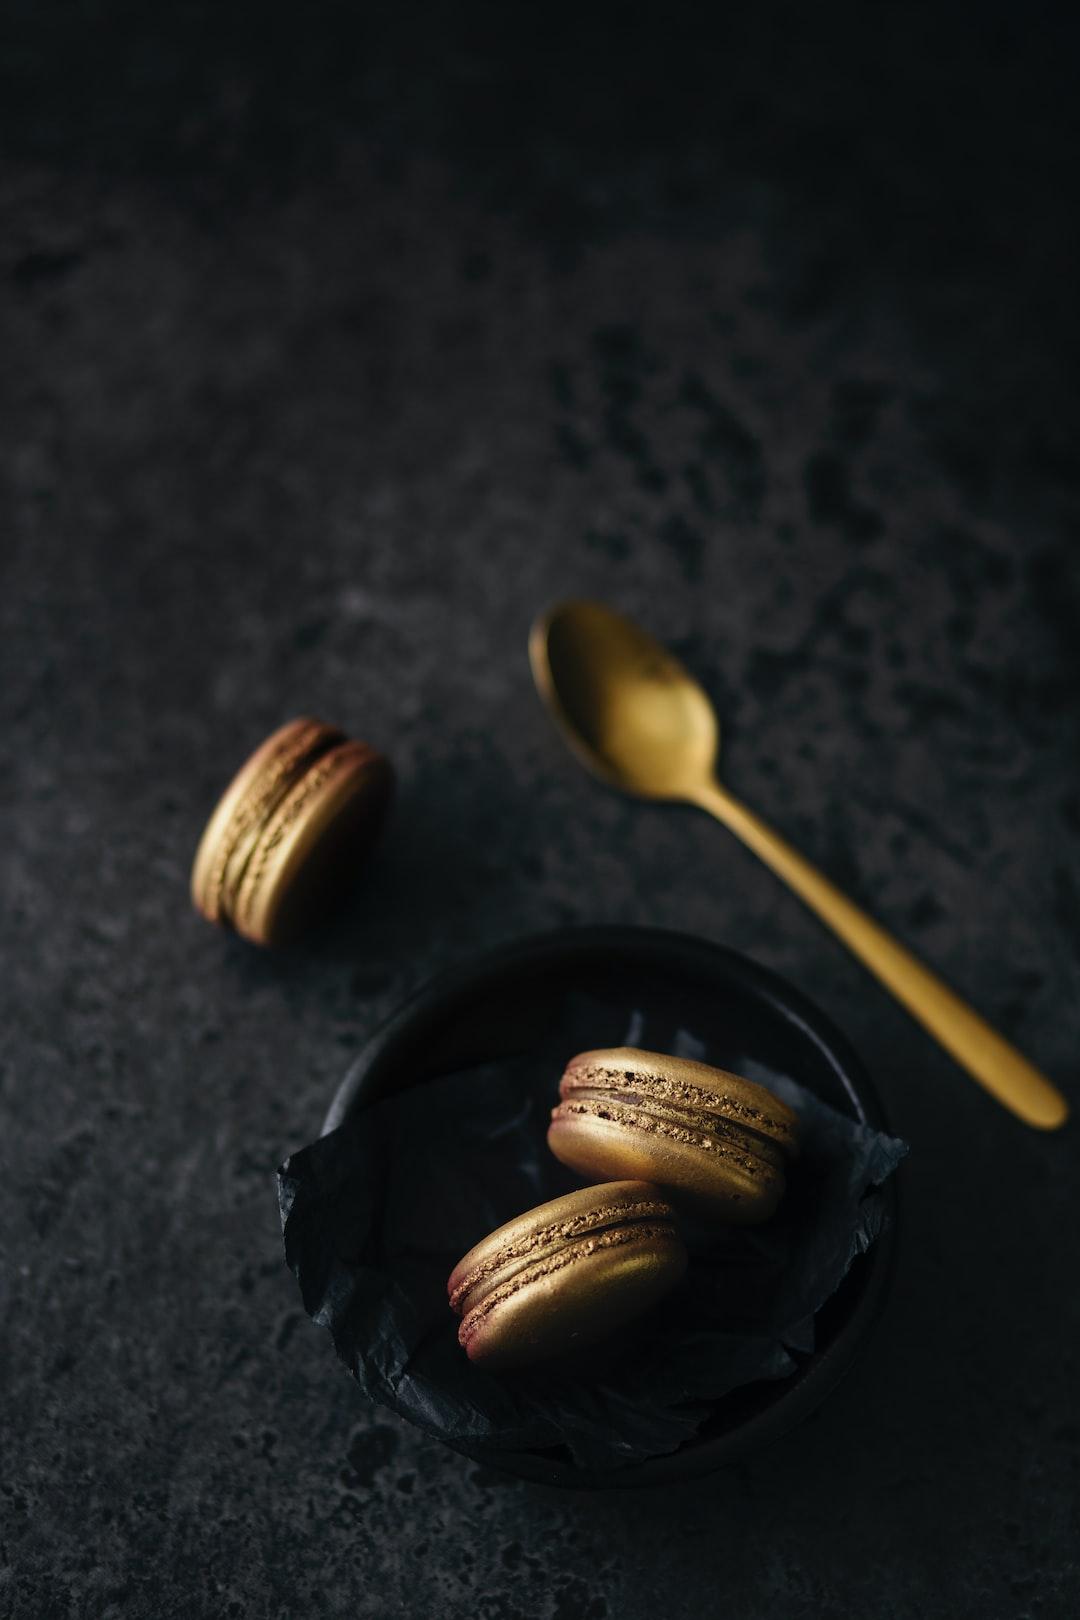 Gold, glamorous, and sweet! Emphasises on those gold sprayed macarons.